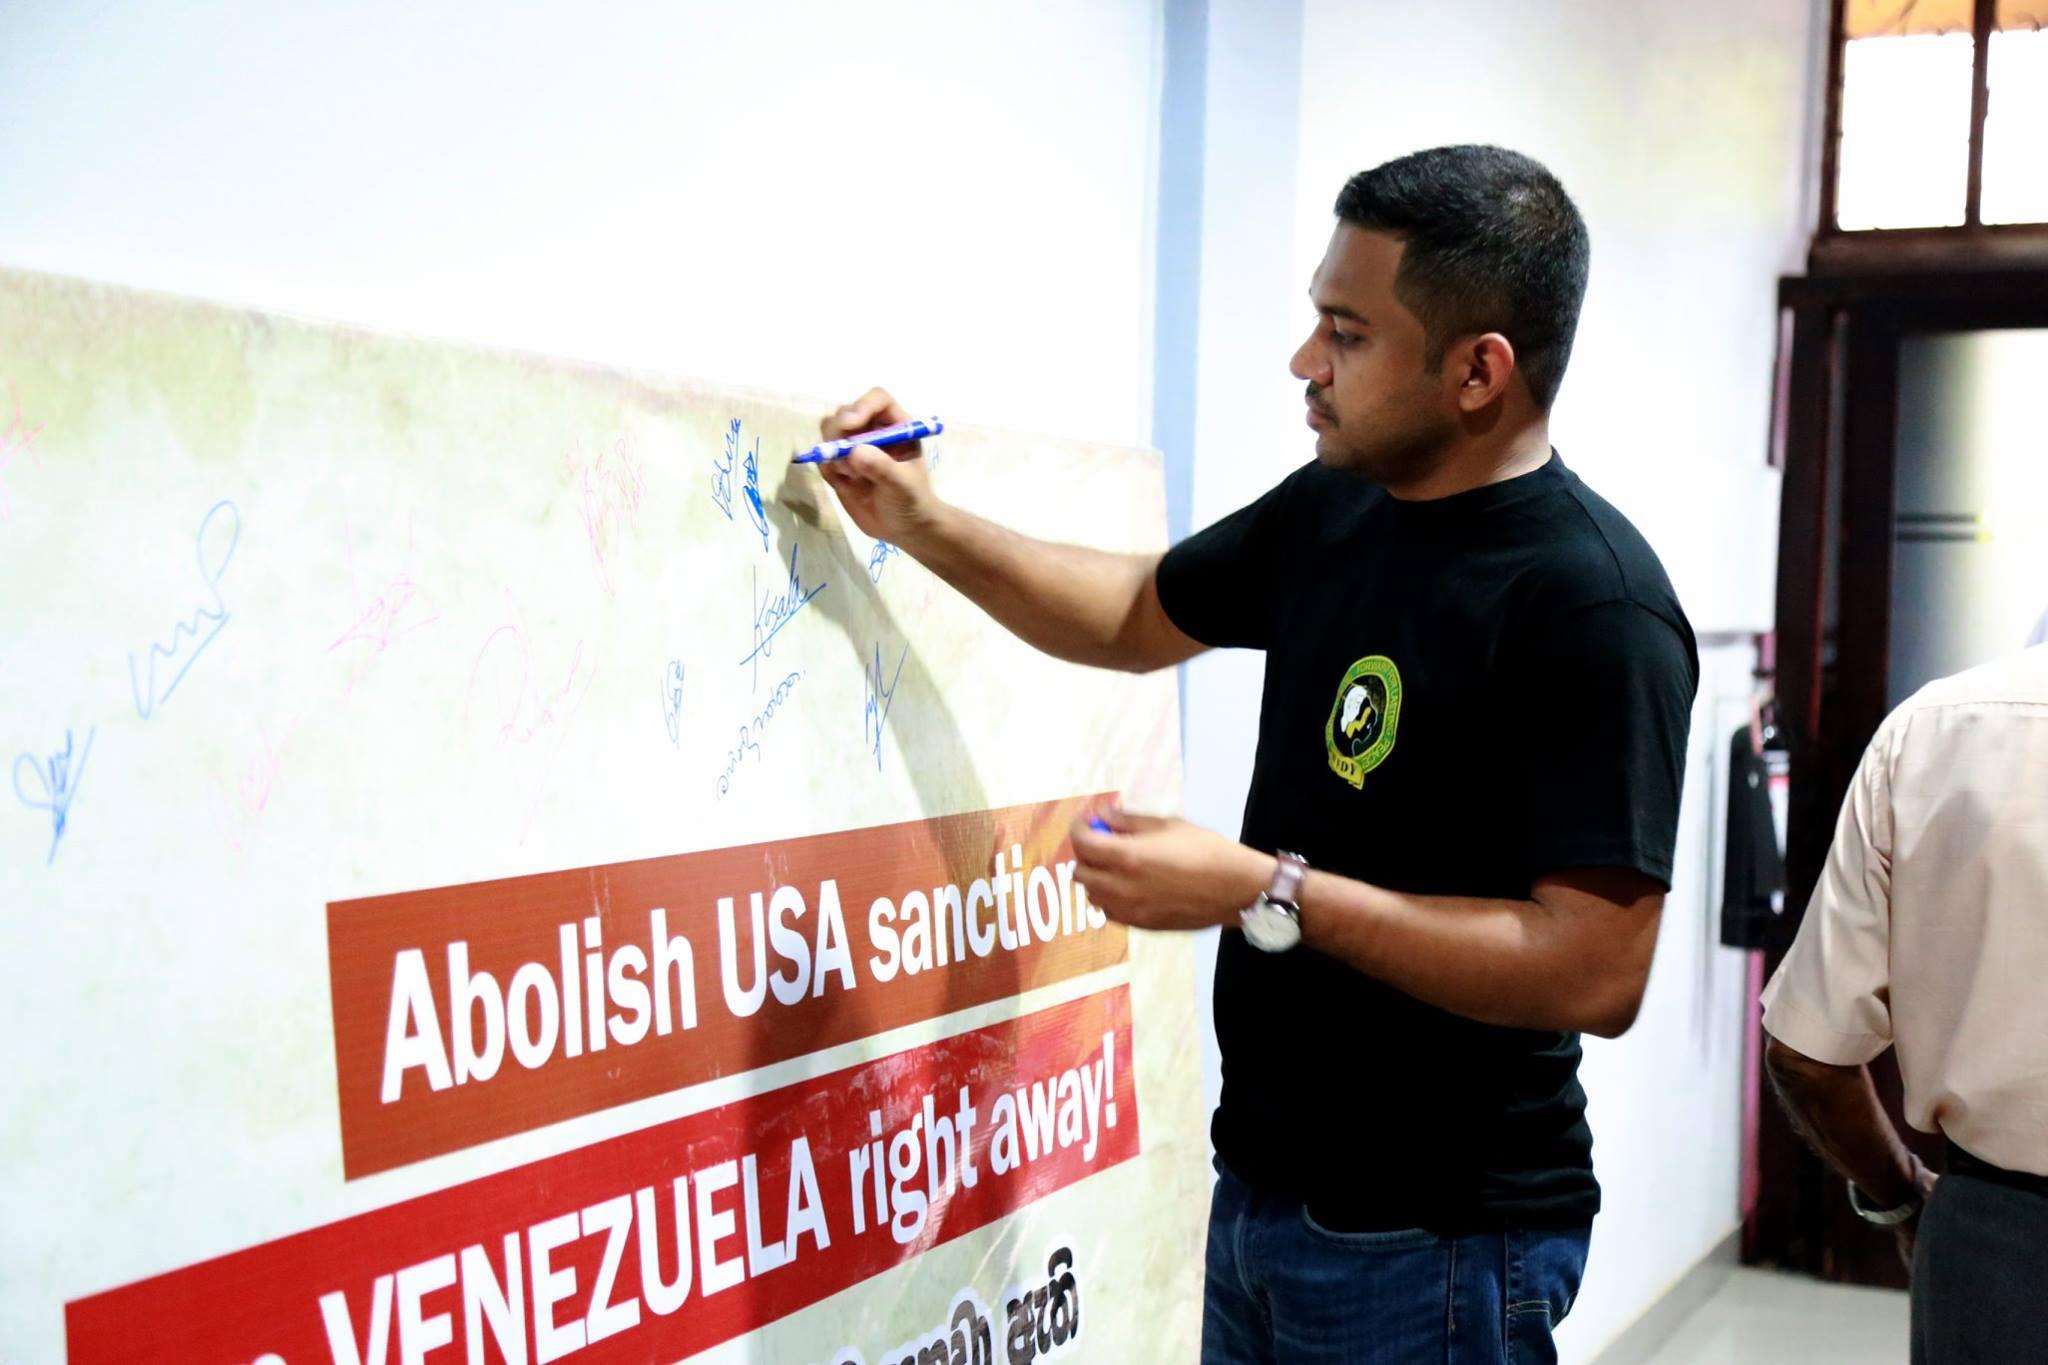 Venezuela-with-Sri-Lanka-2018.05.01-3 (1)